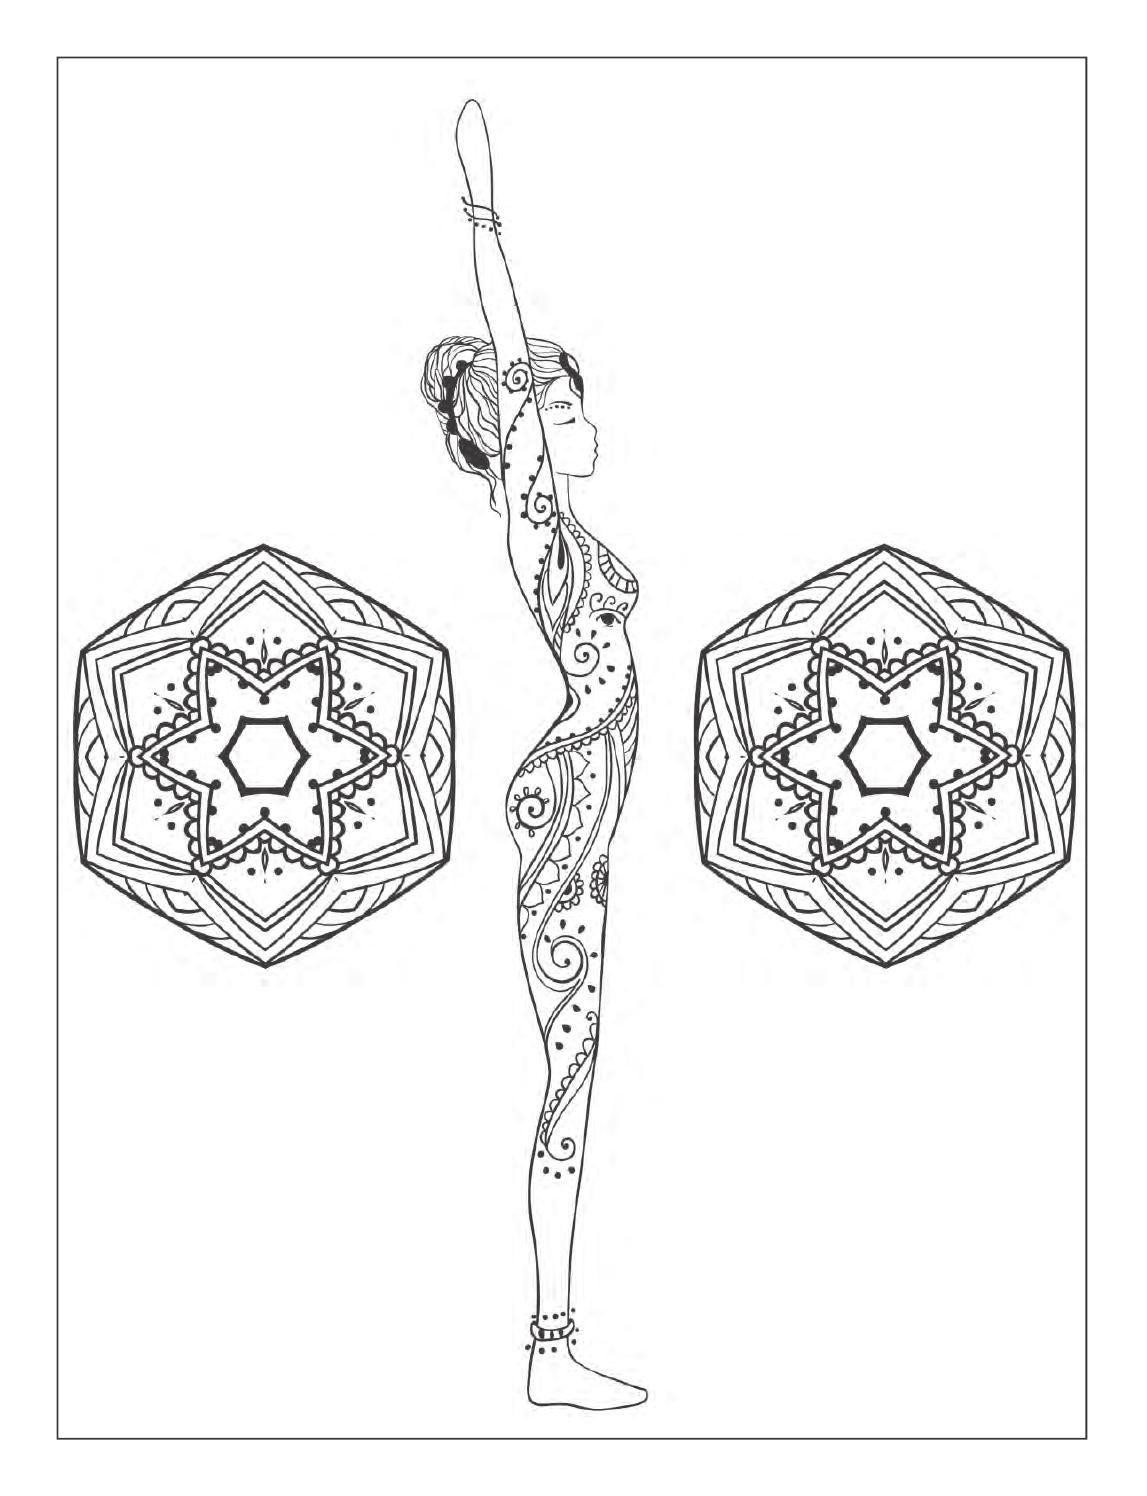 38ab50c78f Yoga and meditation coloring book for adults: With Yoga Poses and Mandalas  by Alexandru Ciobanu - issuu